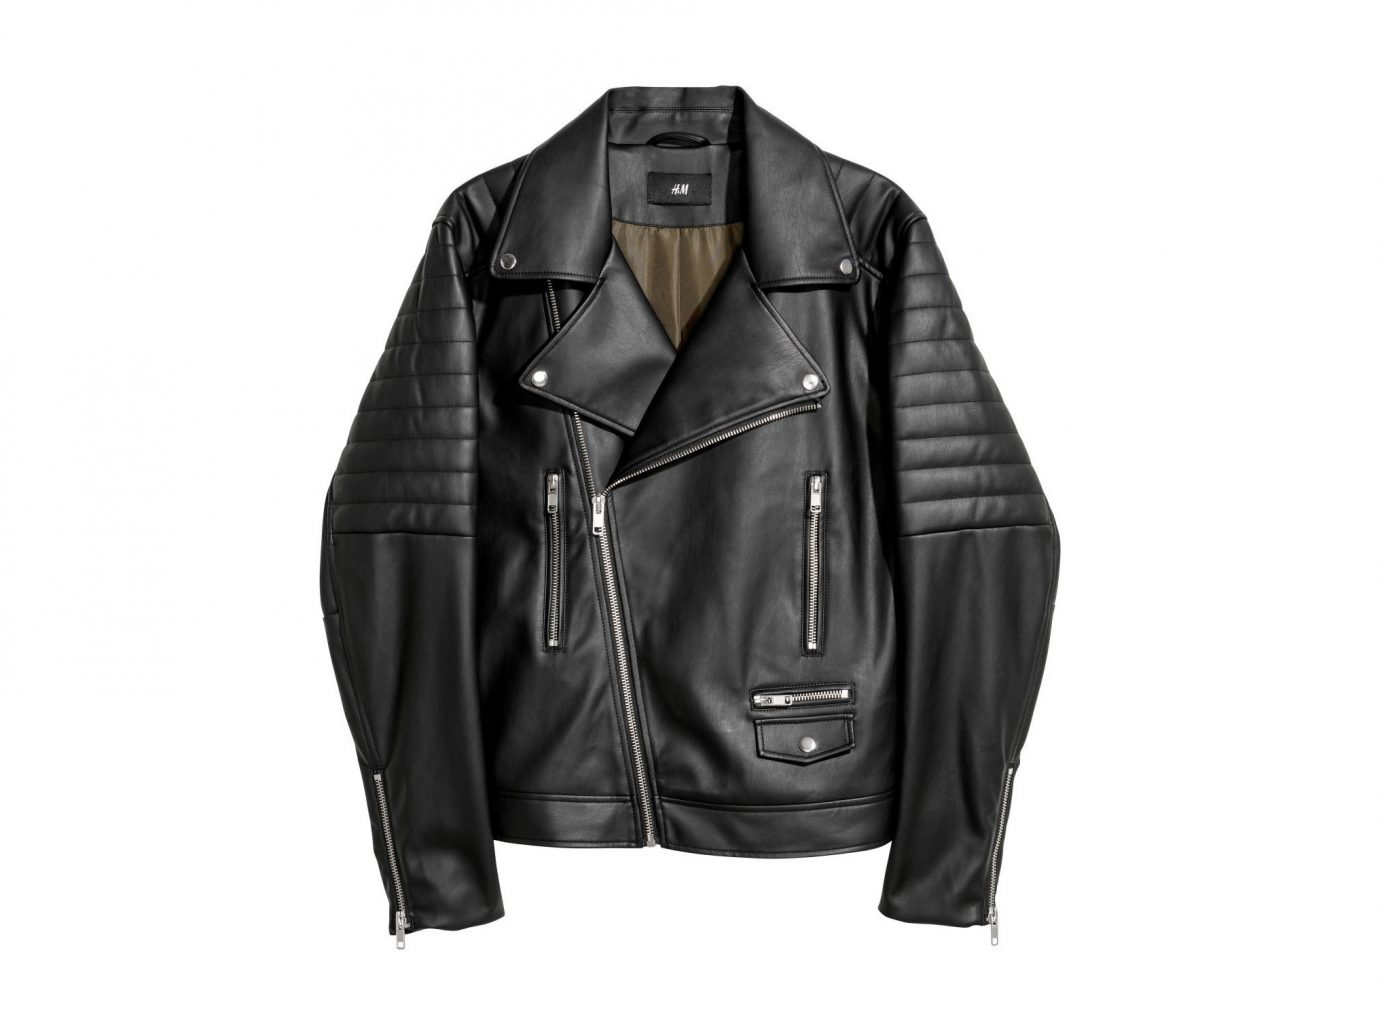 Packing Tips Style + Design Travel Shop jacket black clothing leather jacket leather suit textile product coat pocket material zipper